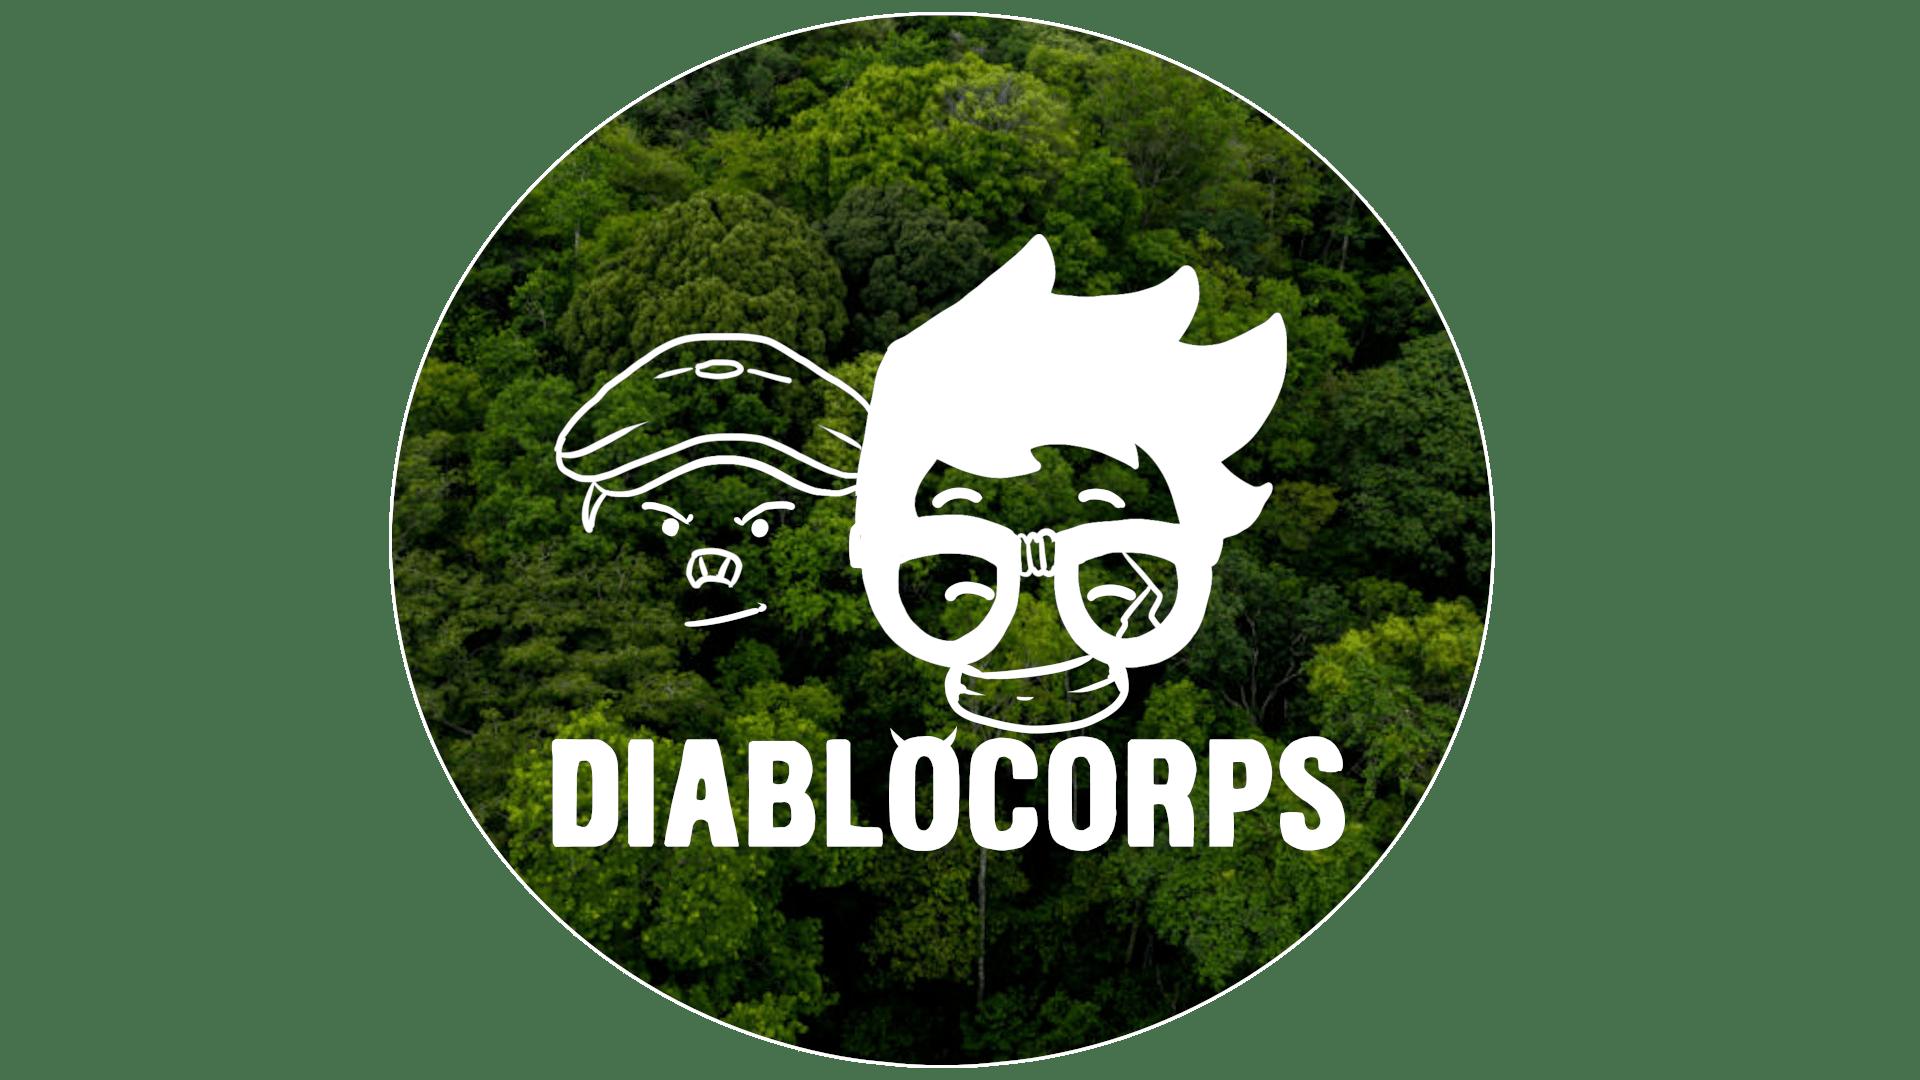 Logo innutswetrust diablocorps